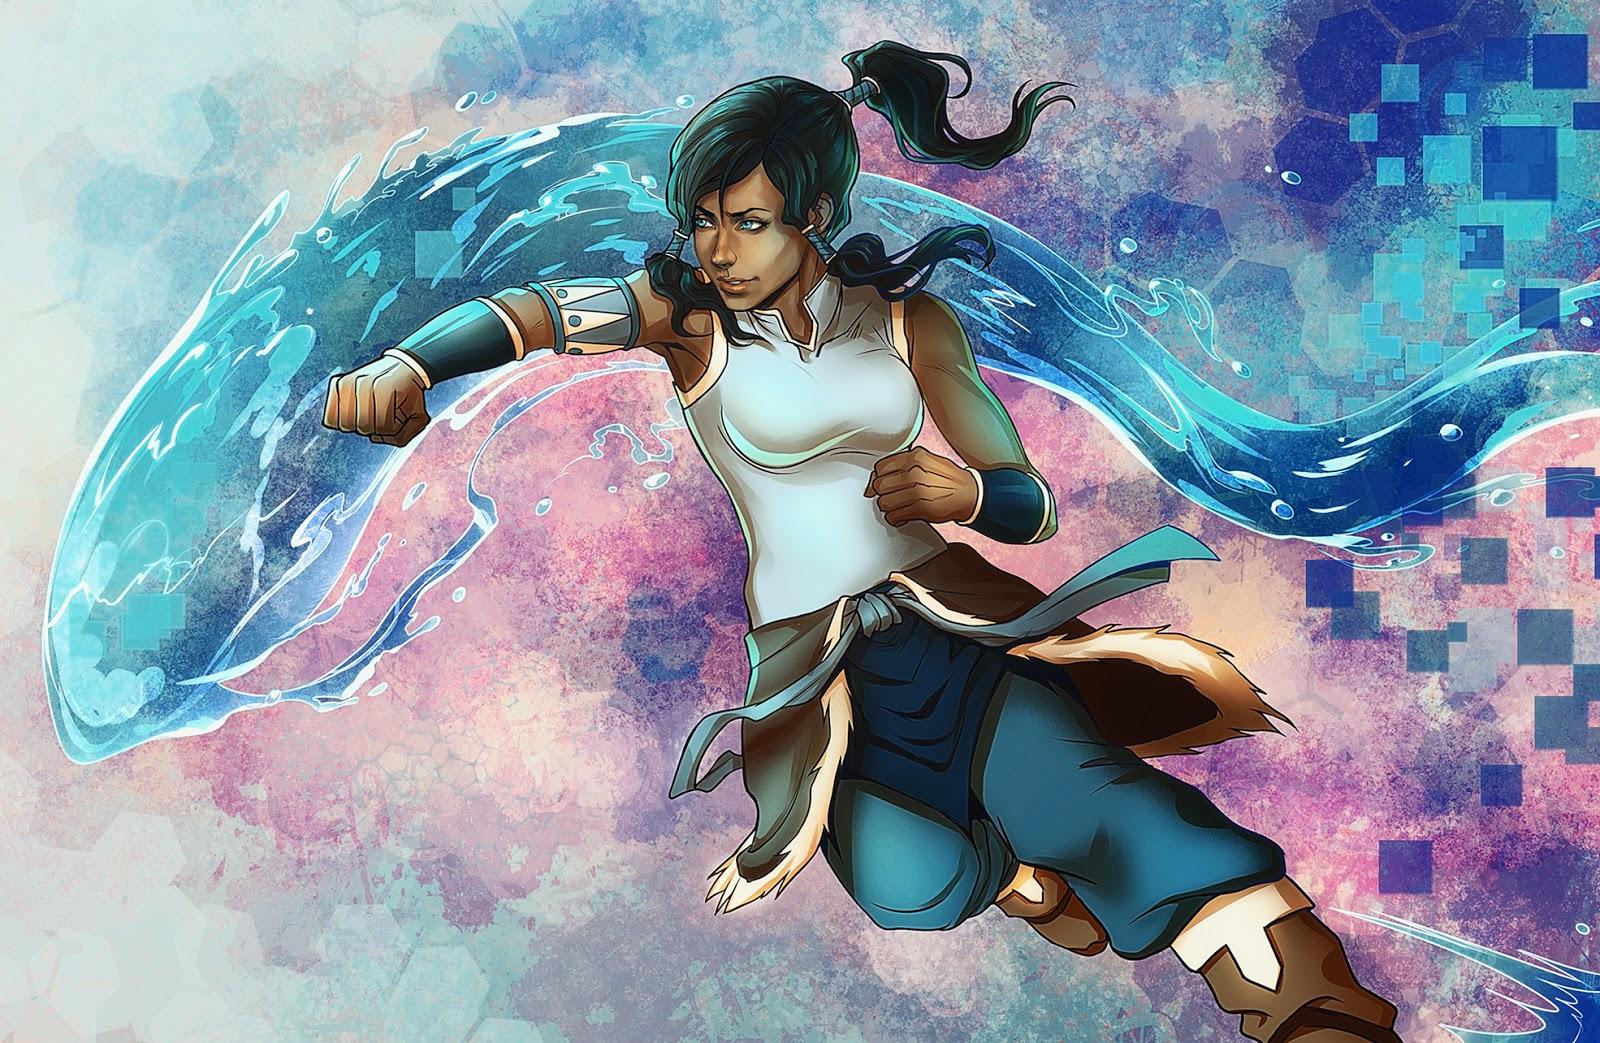 Korra Legend of Korra Waterbending Bender Girl Female HD Wallpaper 1600x1043